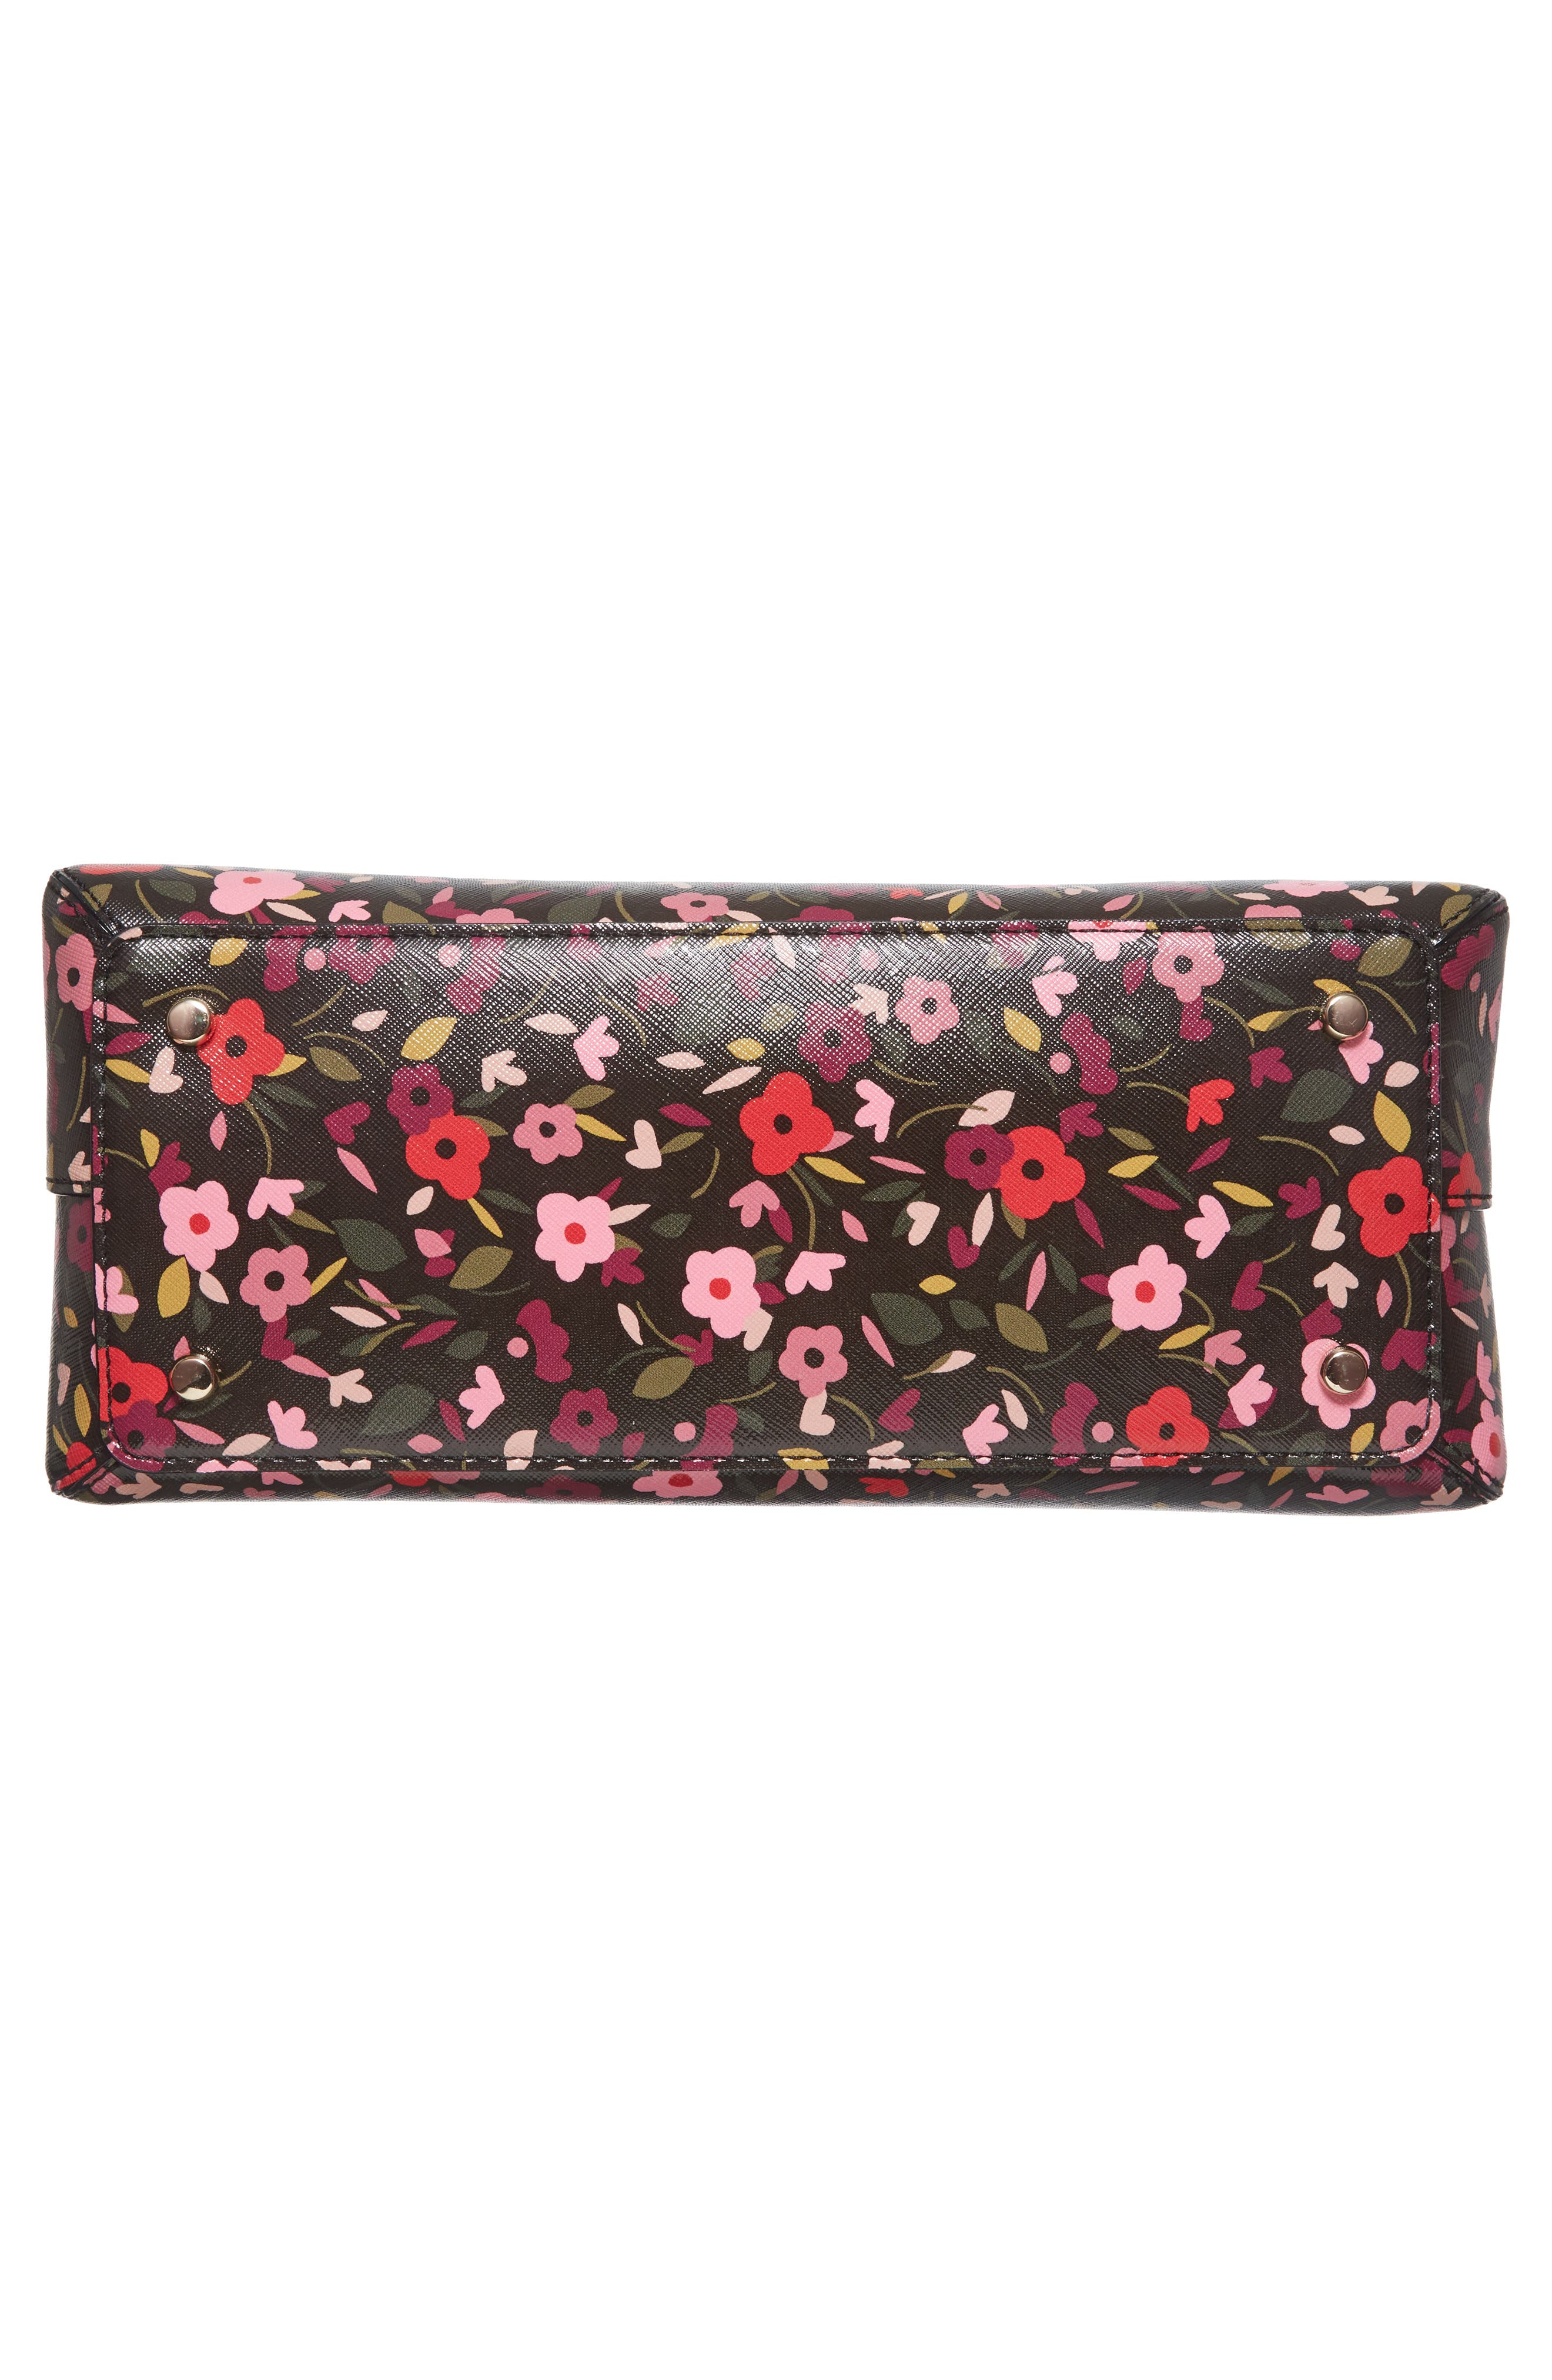 cameron street boho floral- lottie leather satchel,                             Alternate thumbnail 6, color,                             001